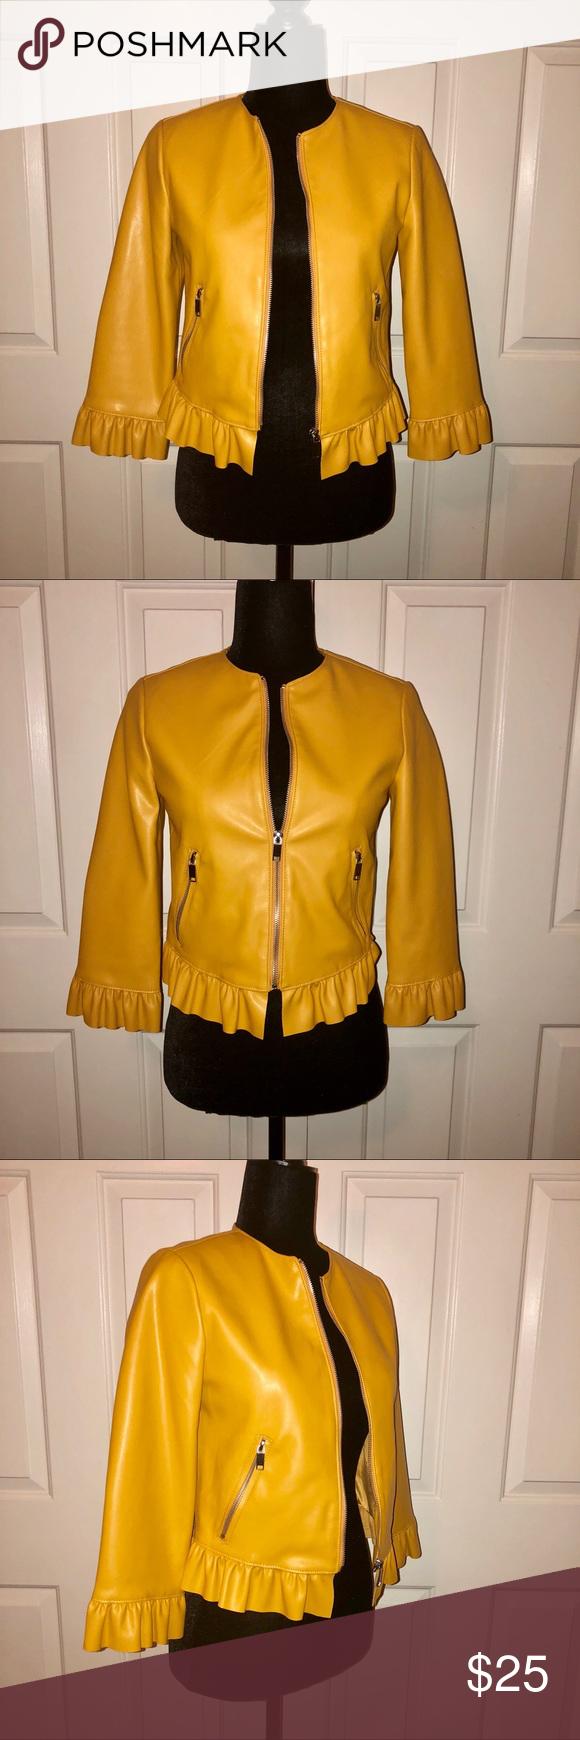 ZARA 3 faux yellow leather jacket. Small Zara basic